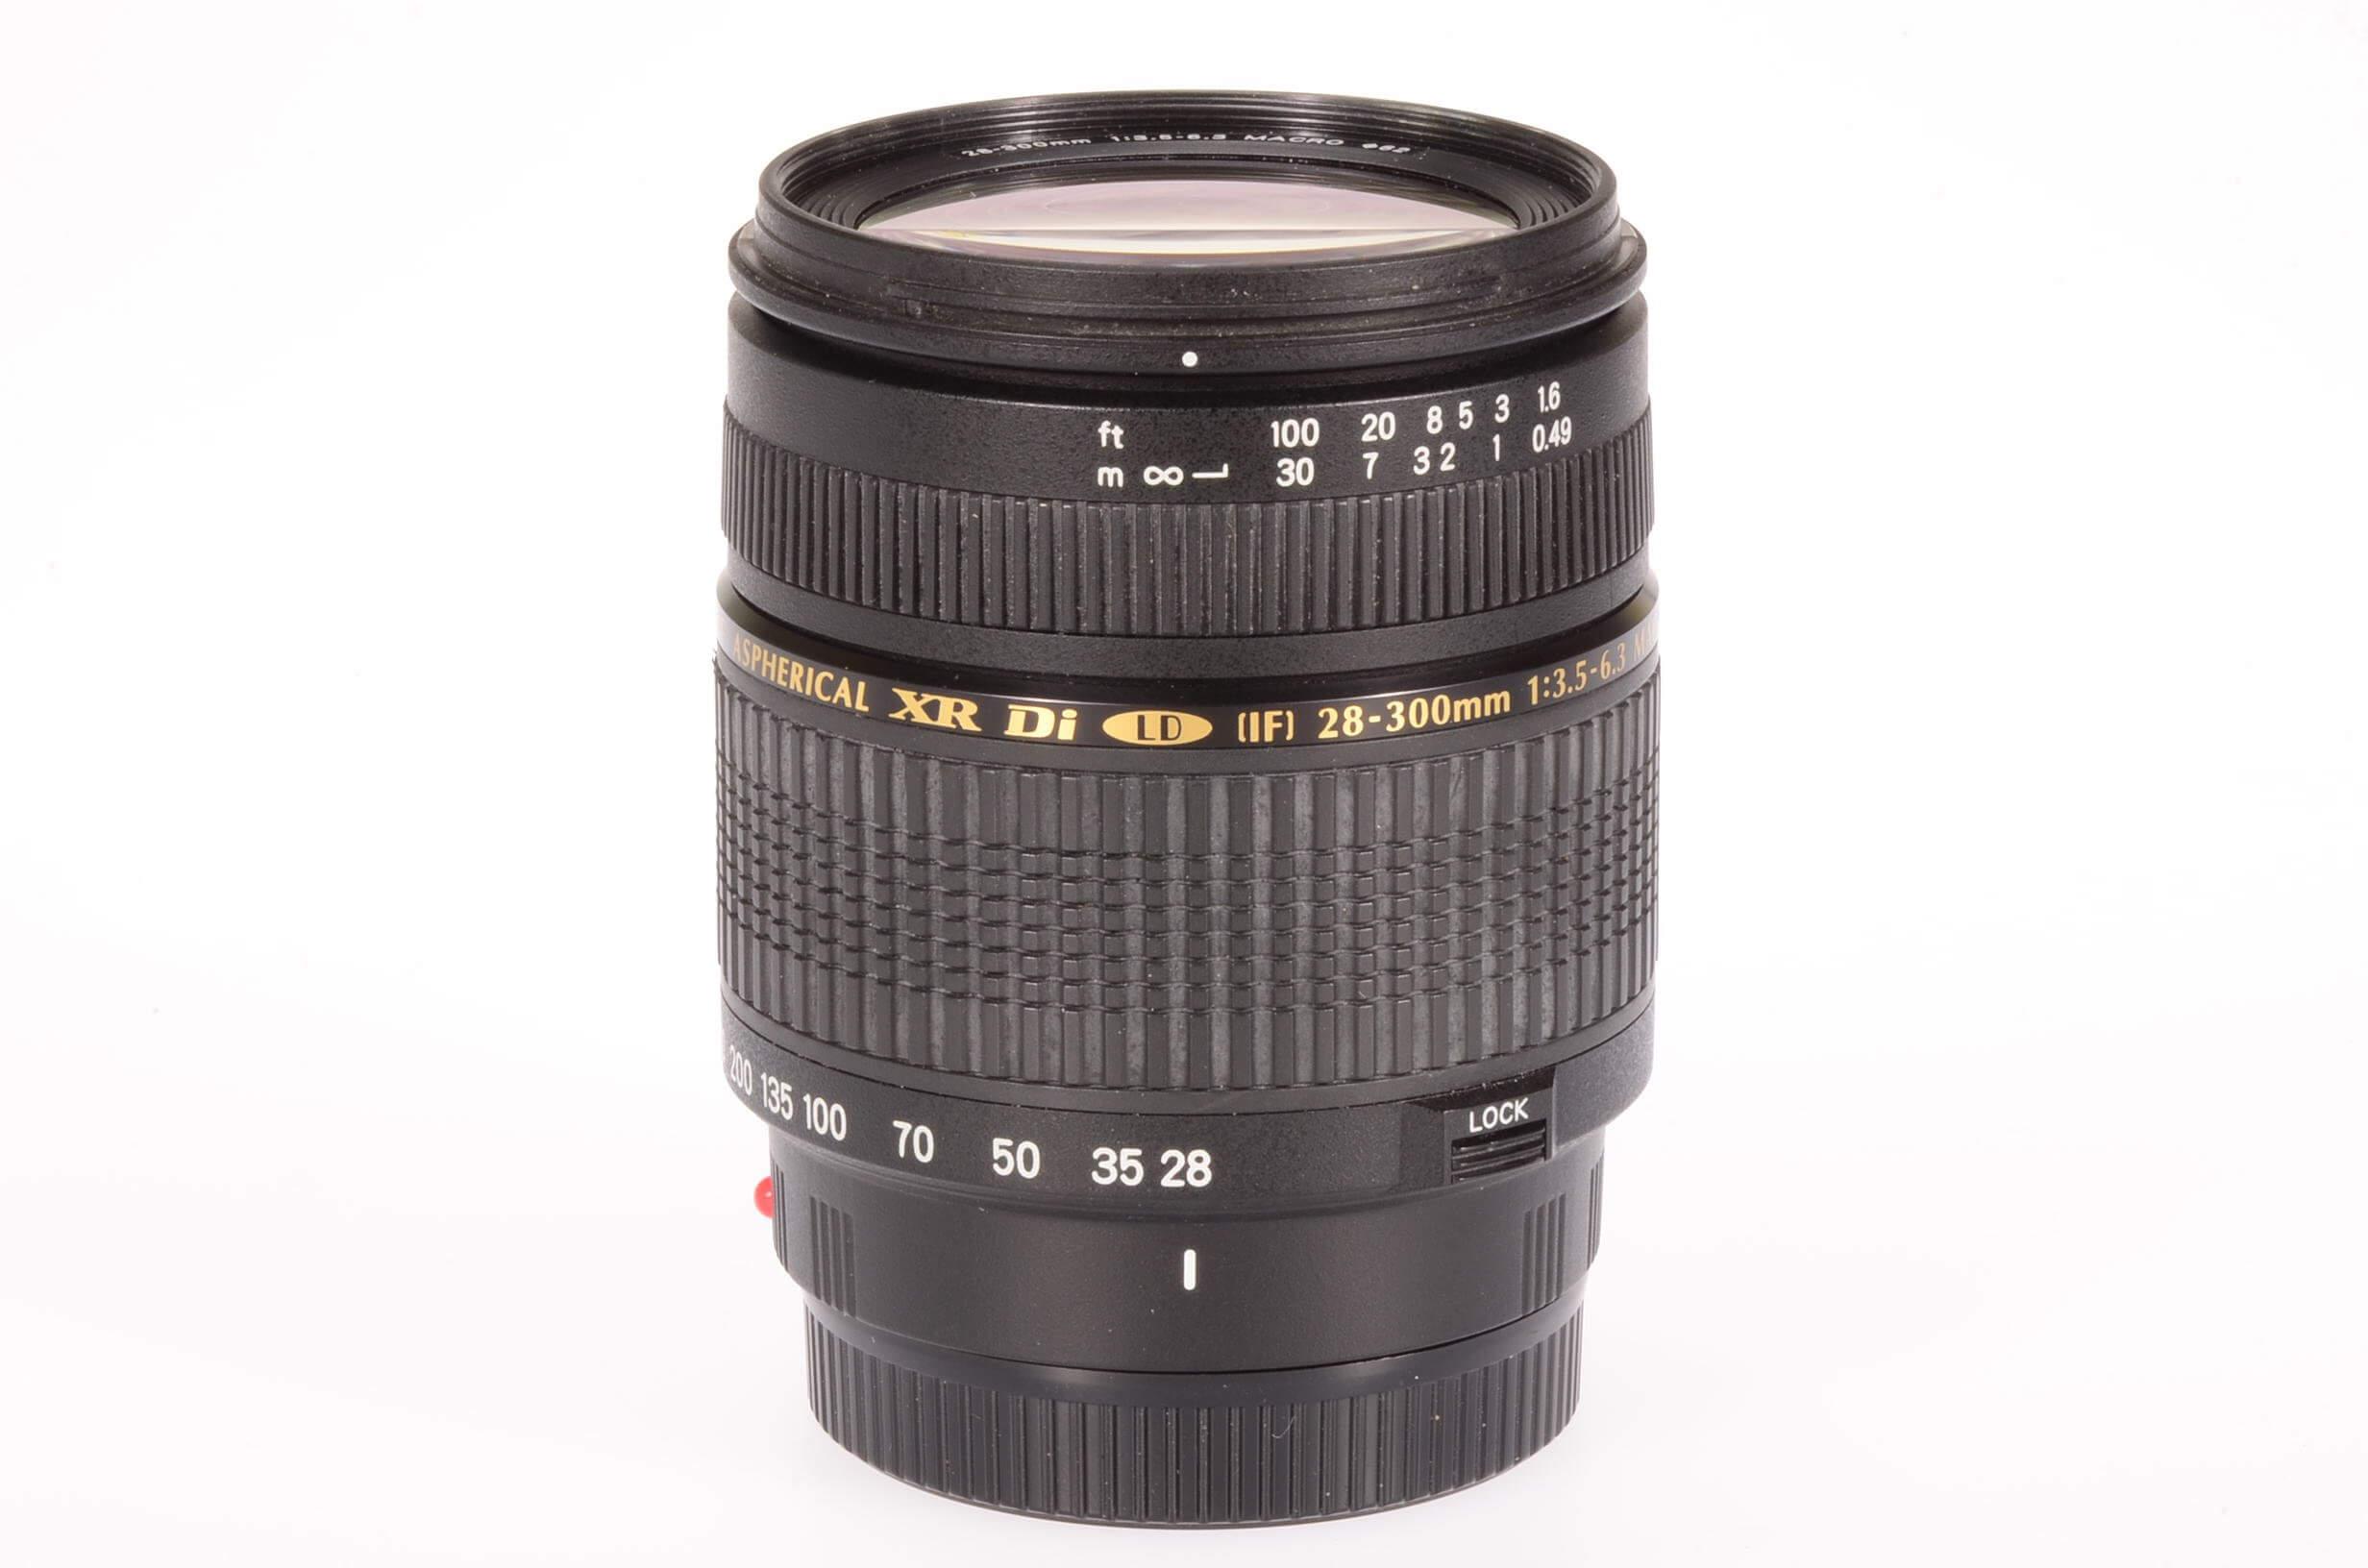 Tamron 28-300mm f3.5-6.3 XR Di LD lens, Sony/Minolta mount